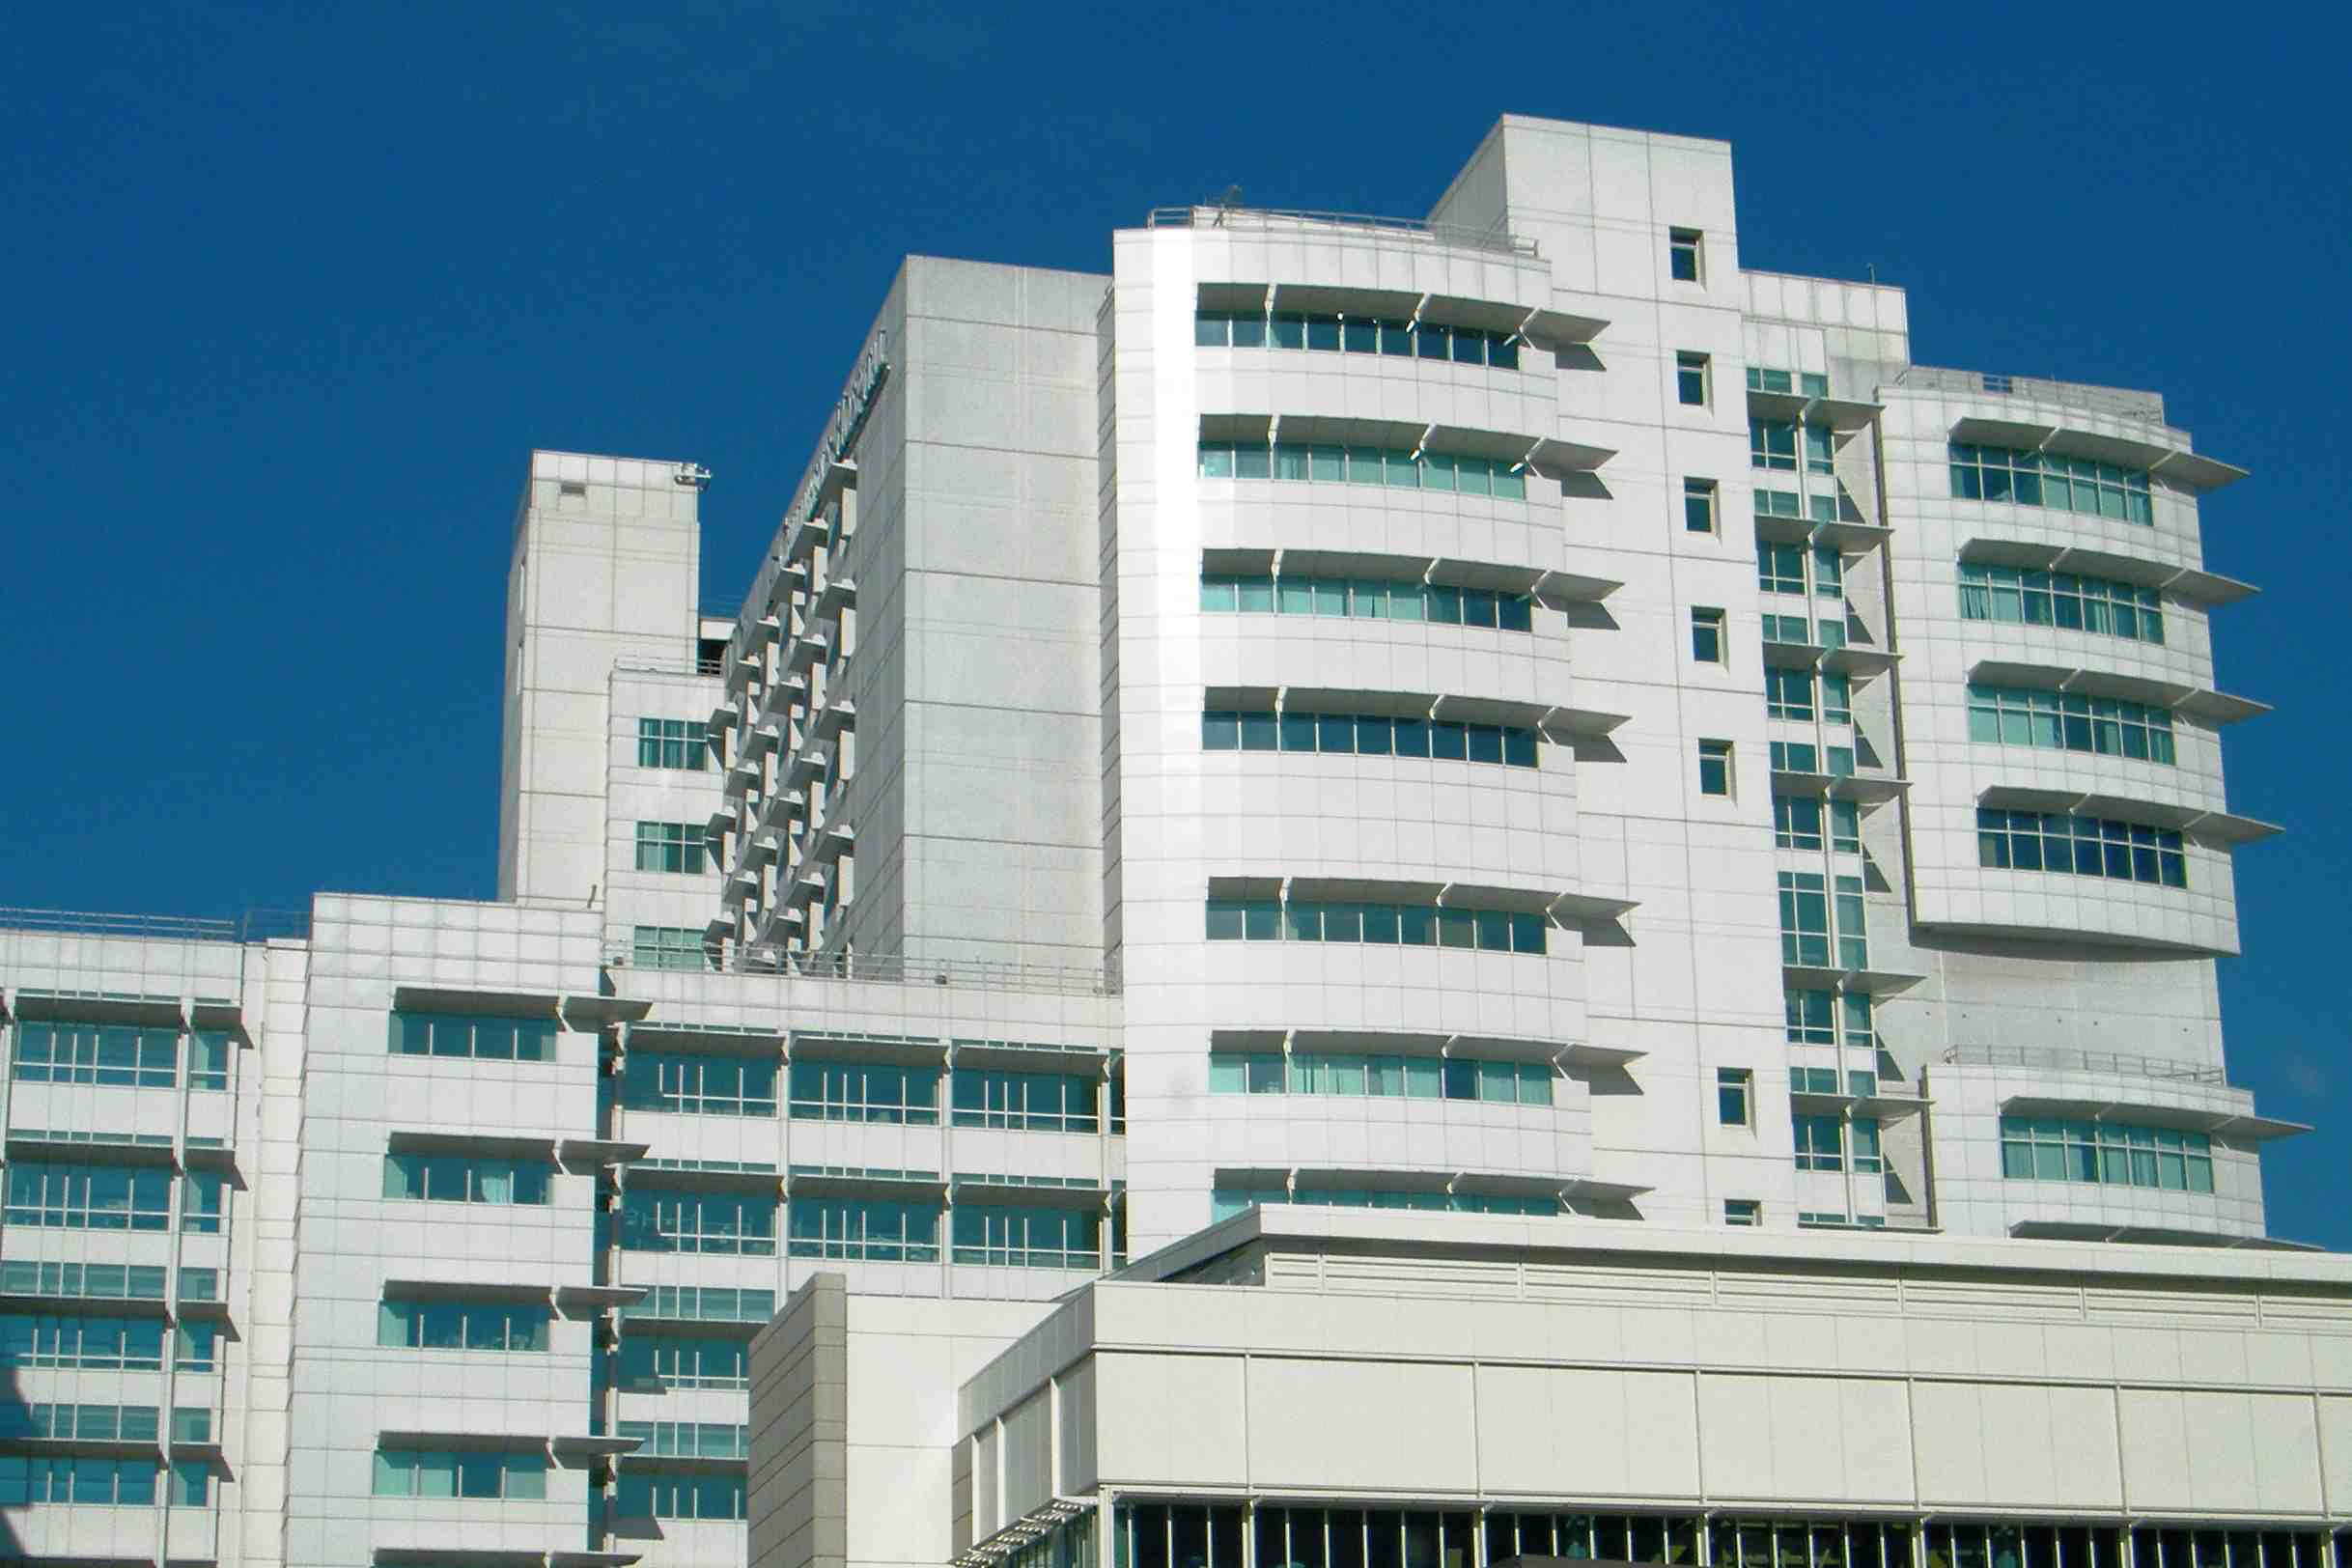 The UC Davis Medical Center